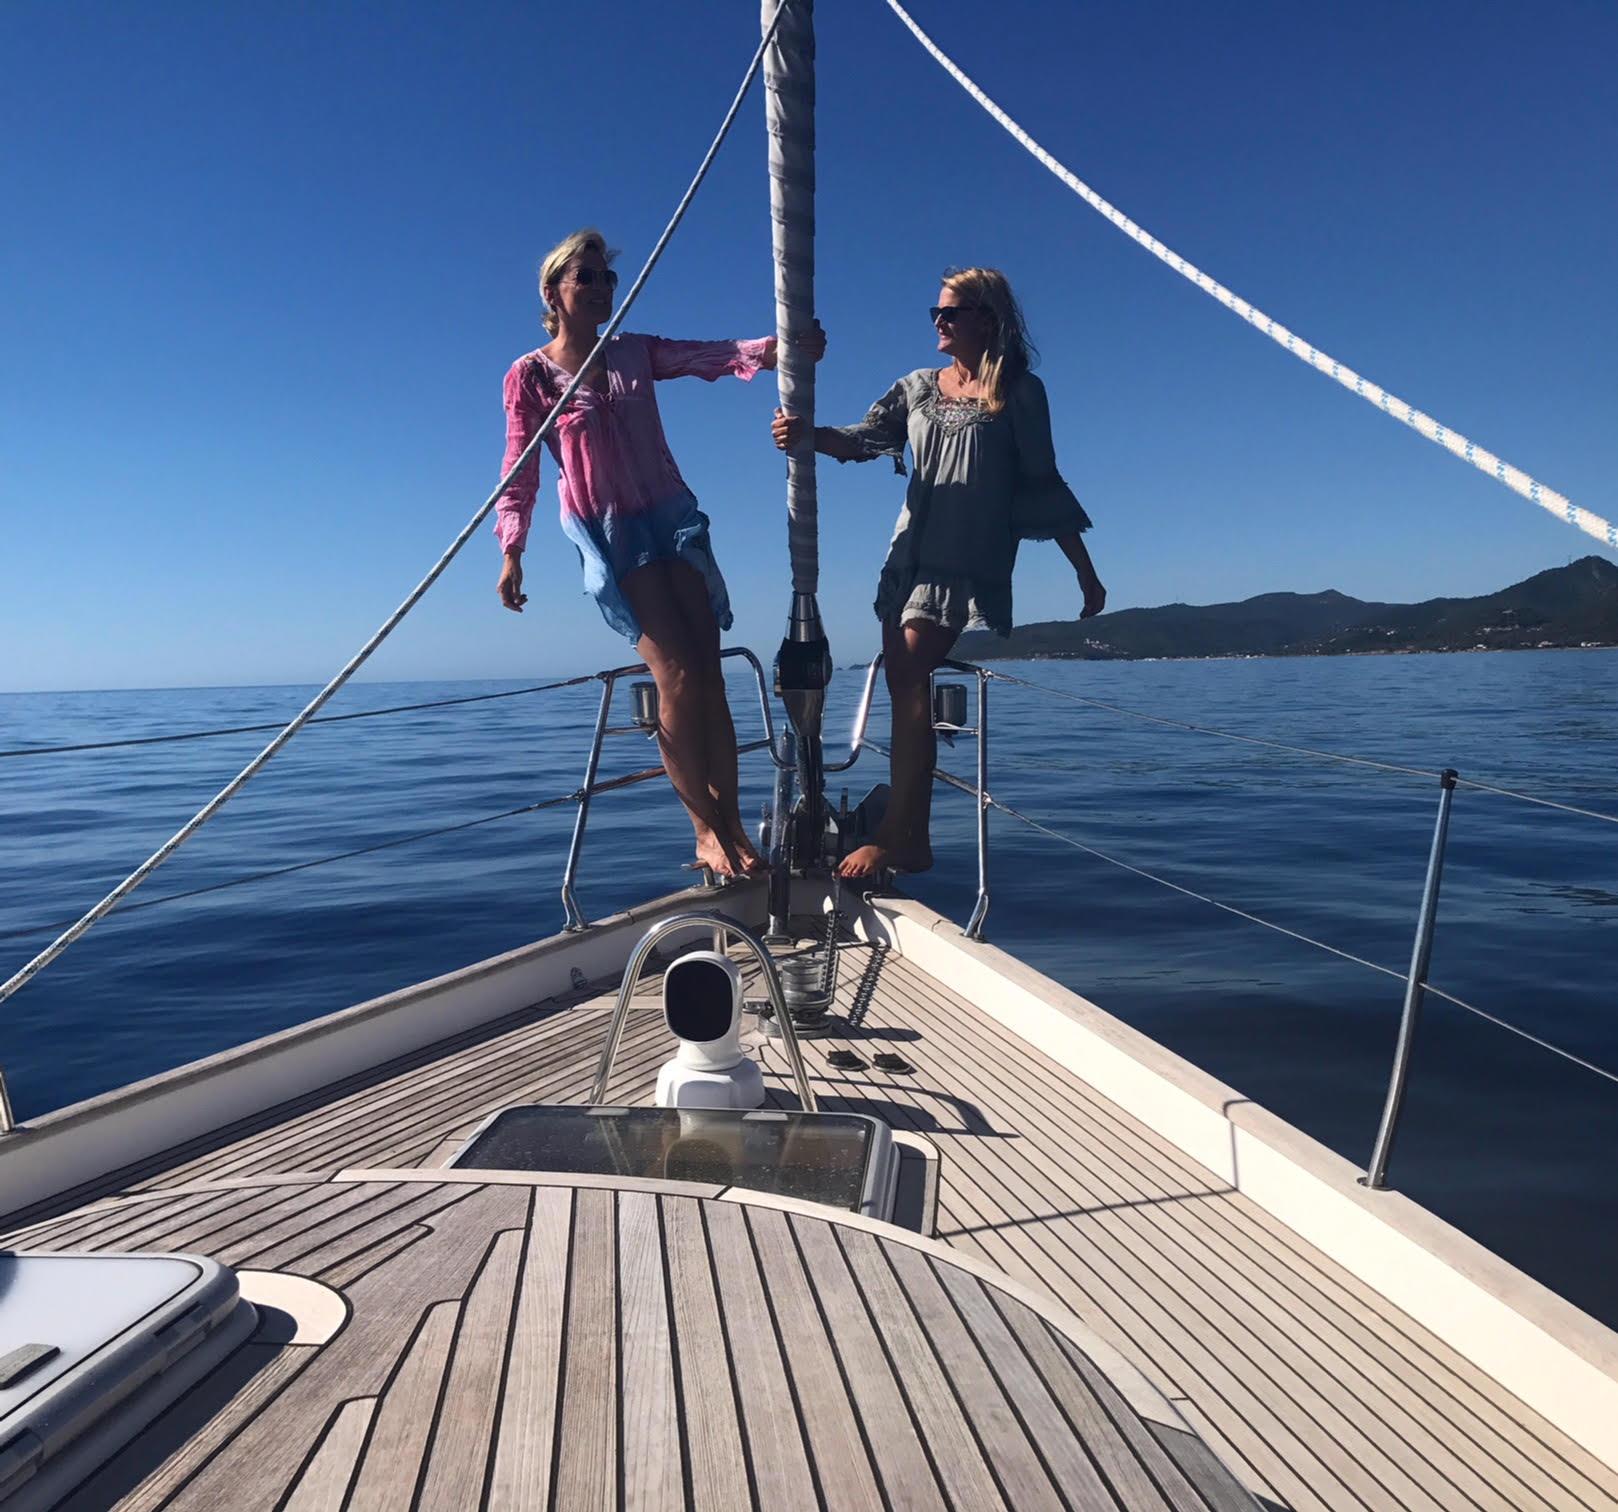 Hallberg-Rassy 43 – Victoria – for SaleA Hallberg Rassy 43 sailing